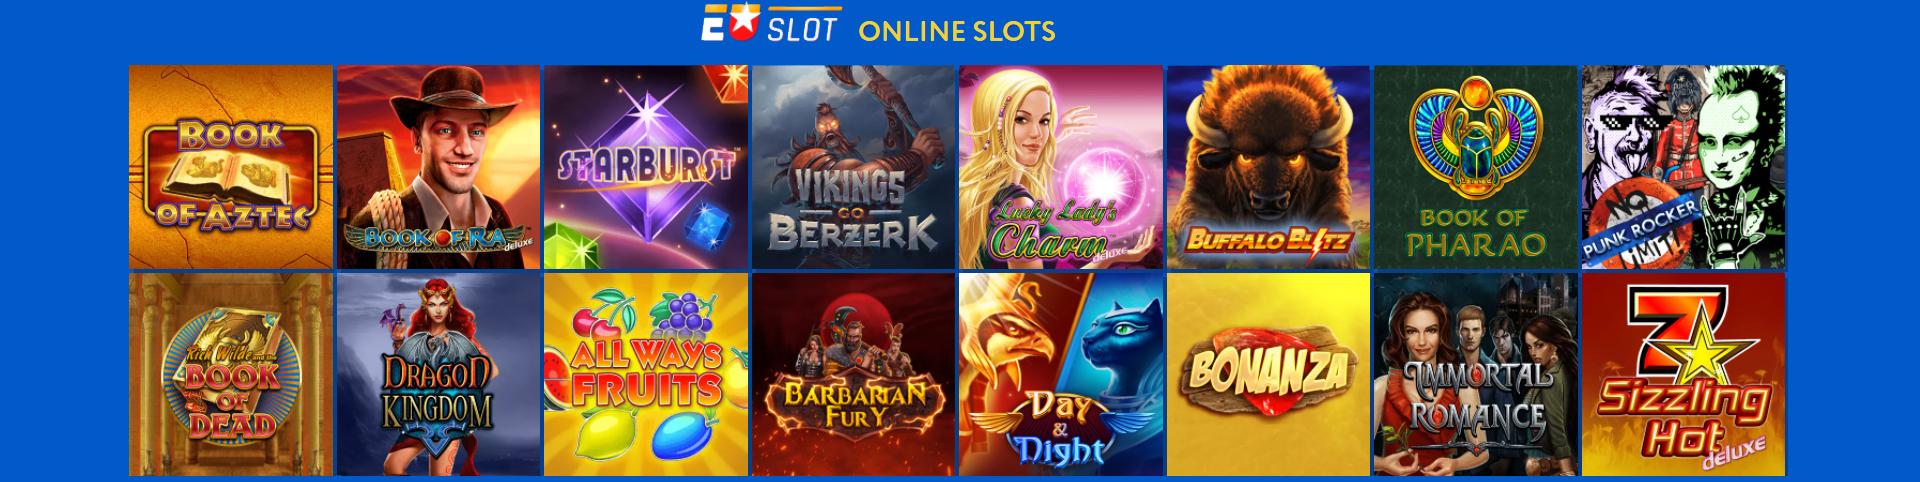 Euslot Casino Slots.